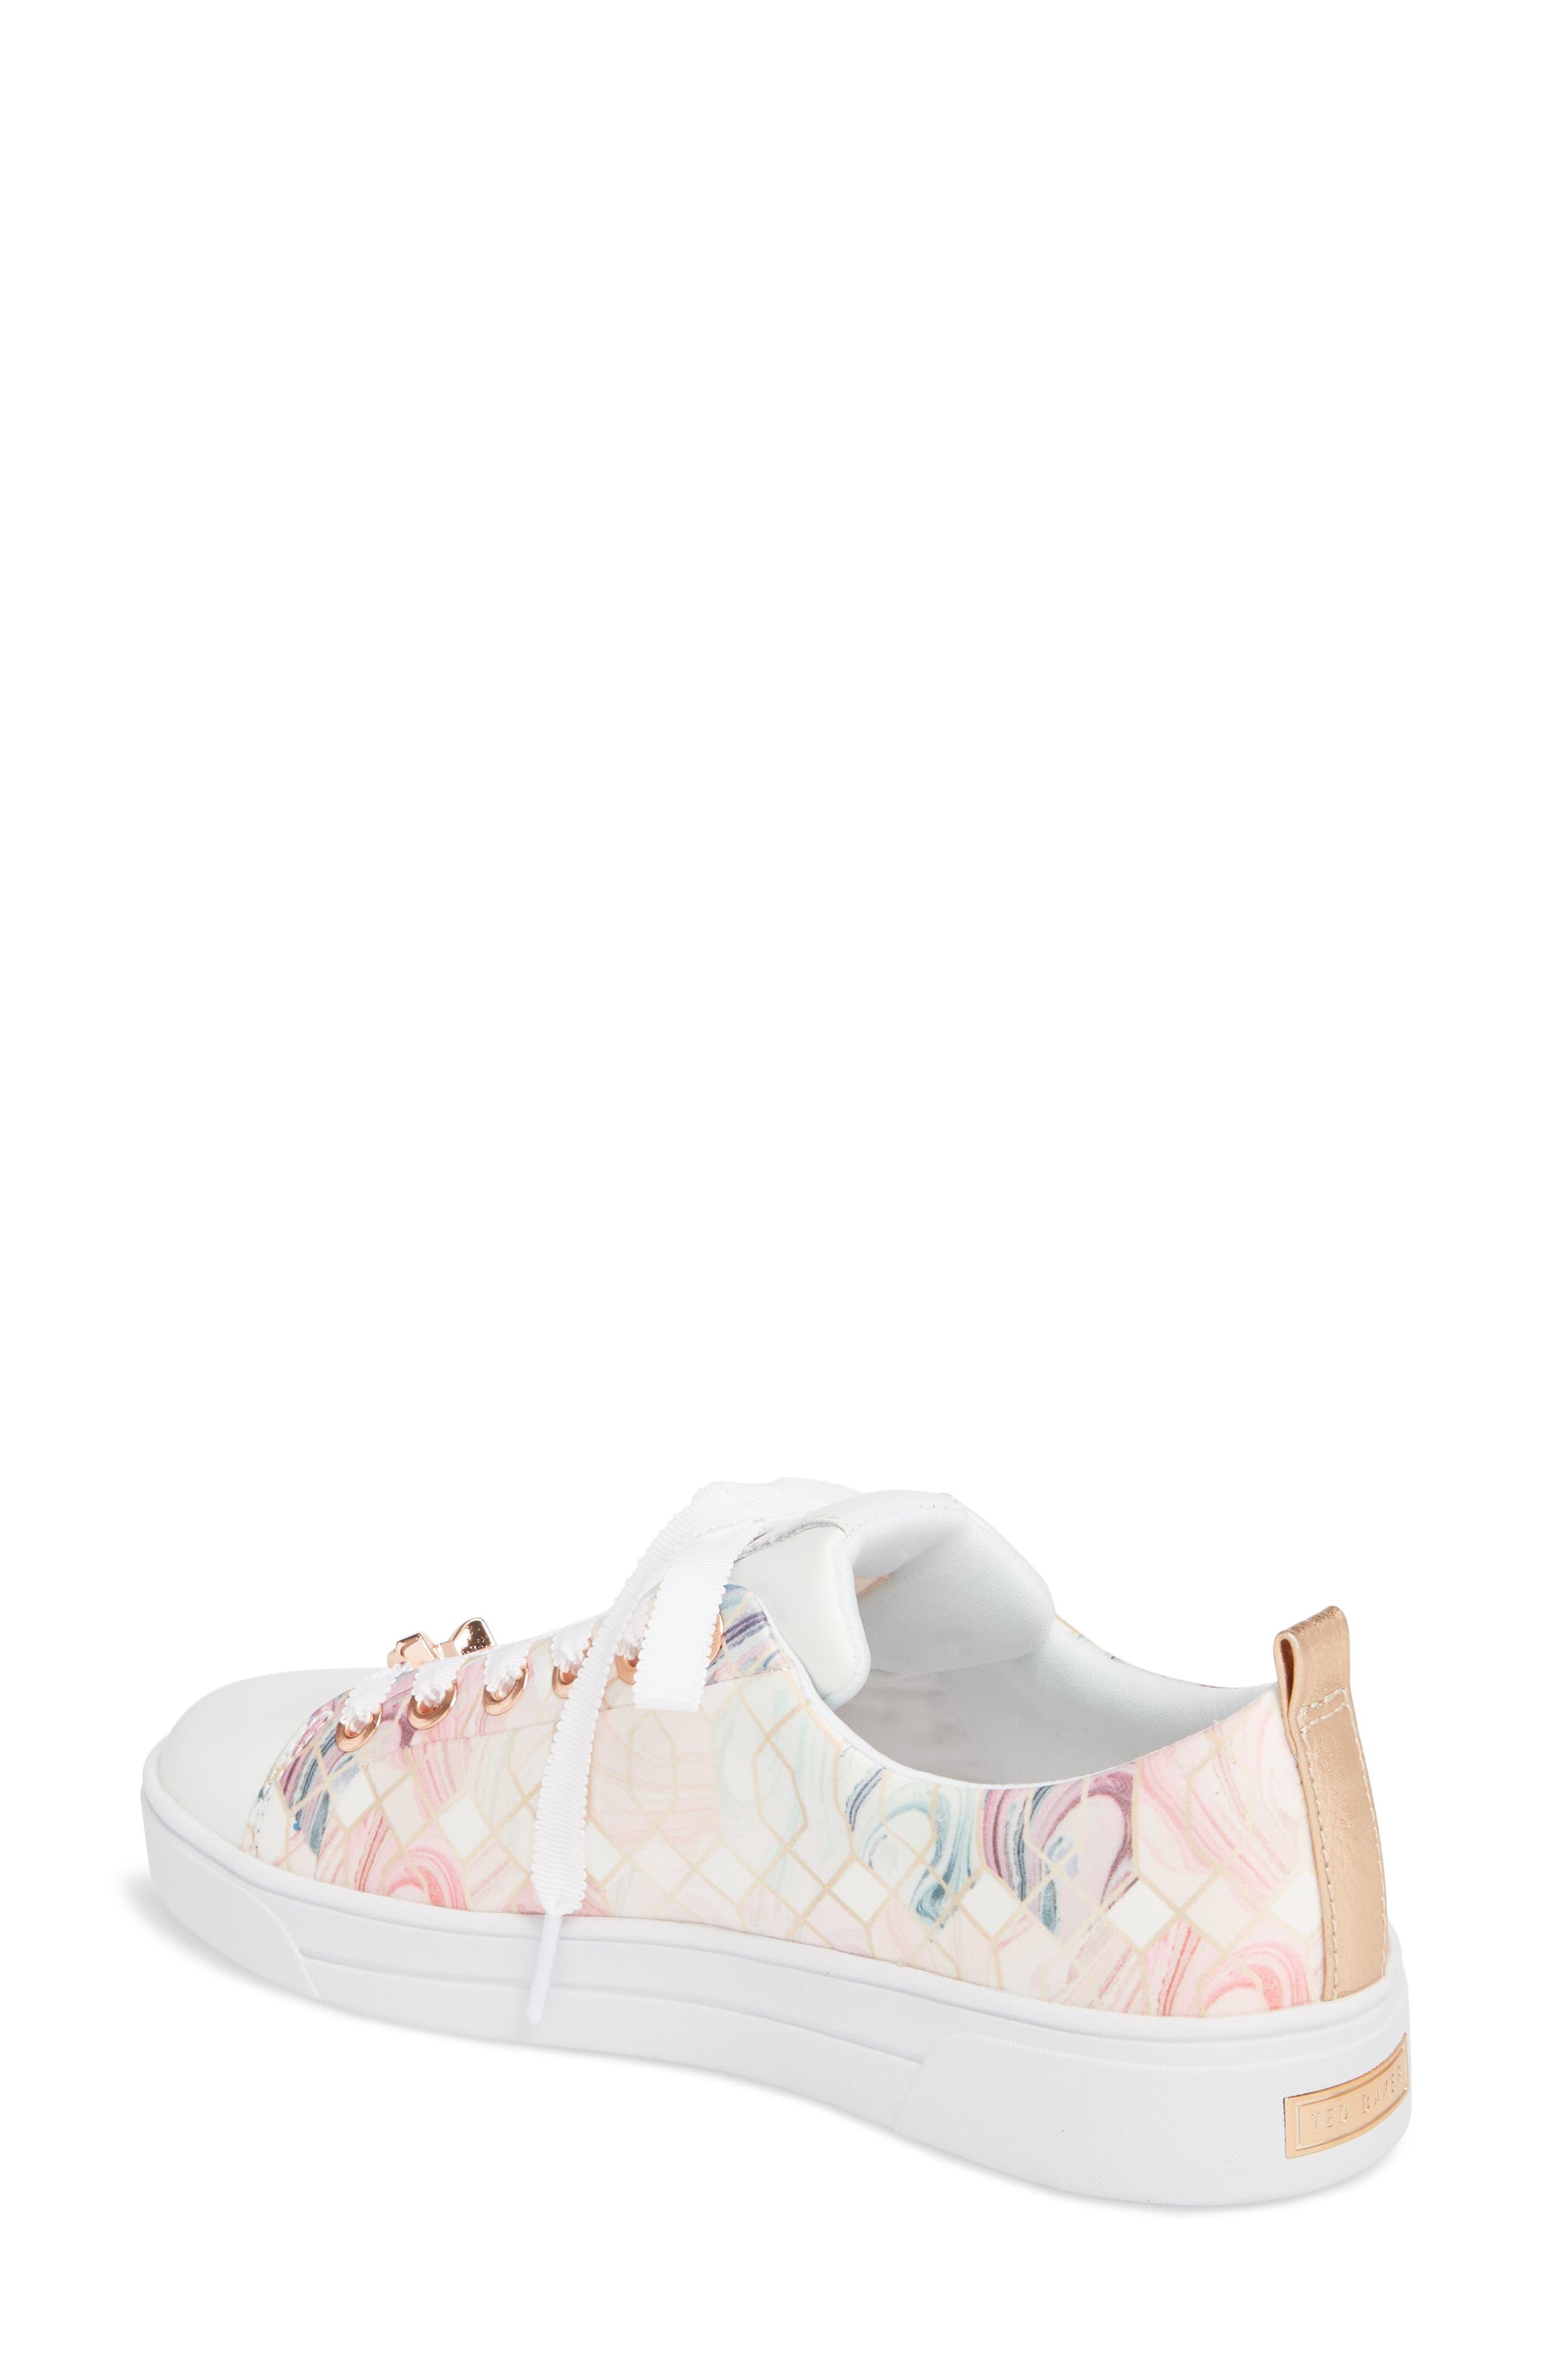 Ahfira Sneaker,                             Alternate thumbnail 2, color,                             Sea Of Clouds Print Fabric